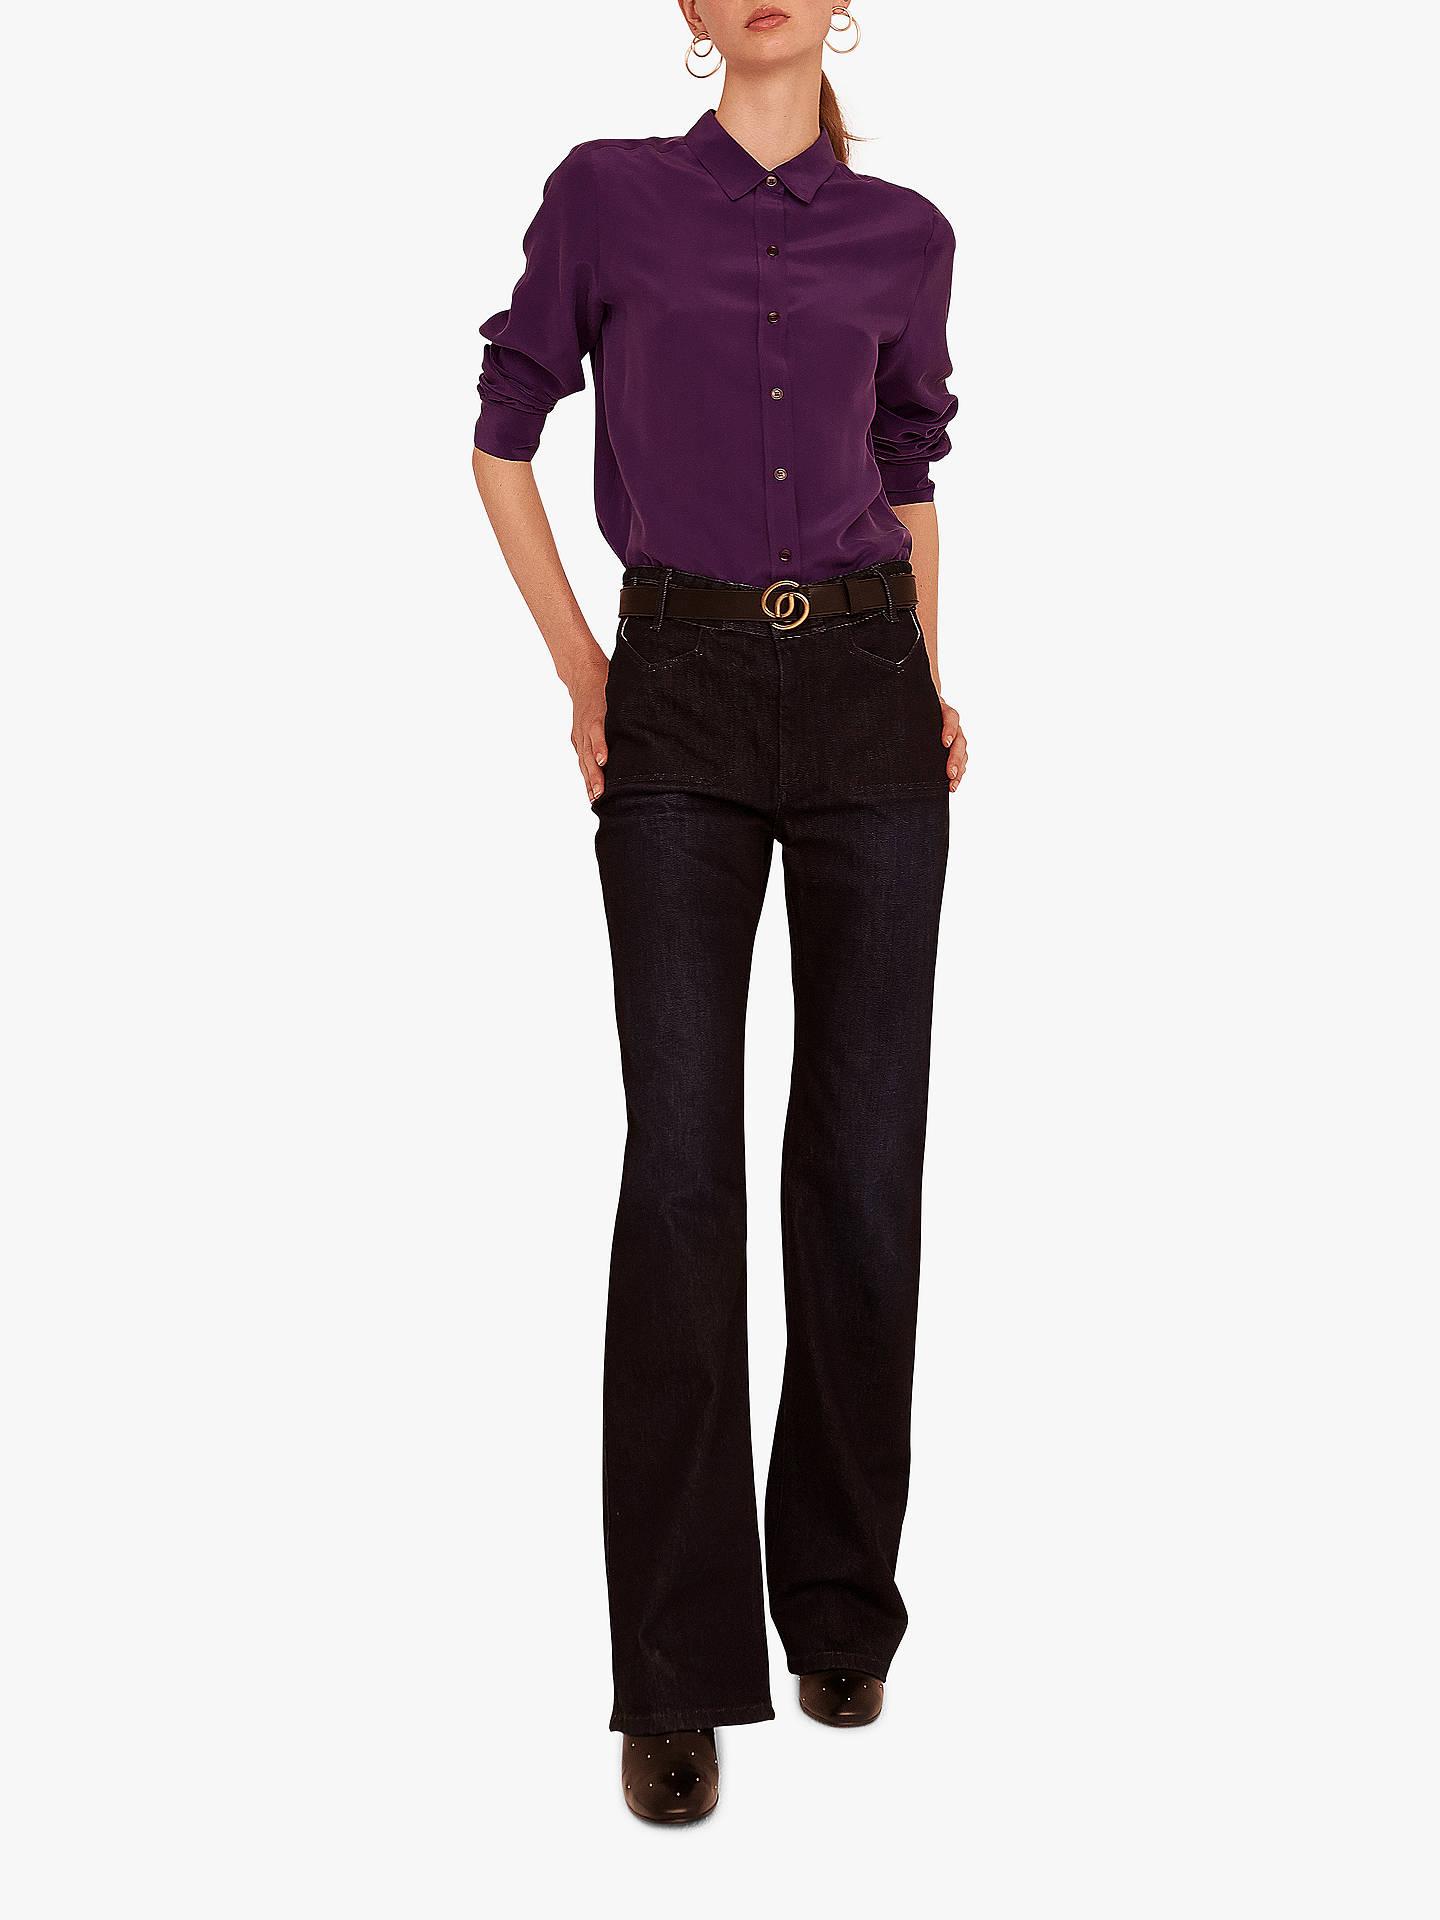 8dbee54e2ab639 ... Buy Gerard Darel Lila Silk Blouse, Purple, 6 Online at johnlewis.com ...